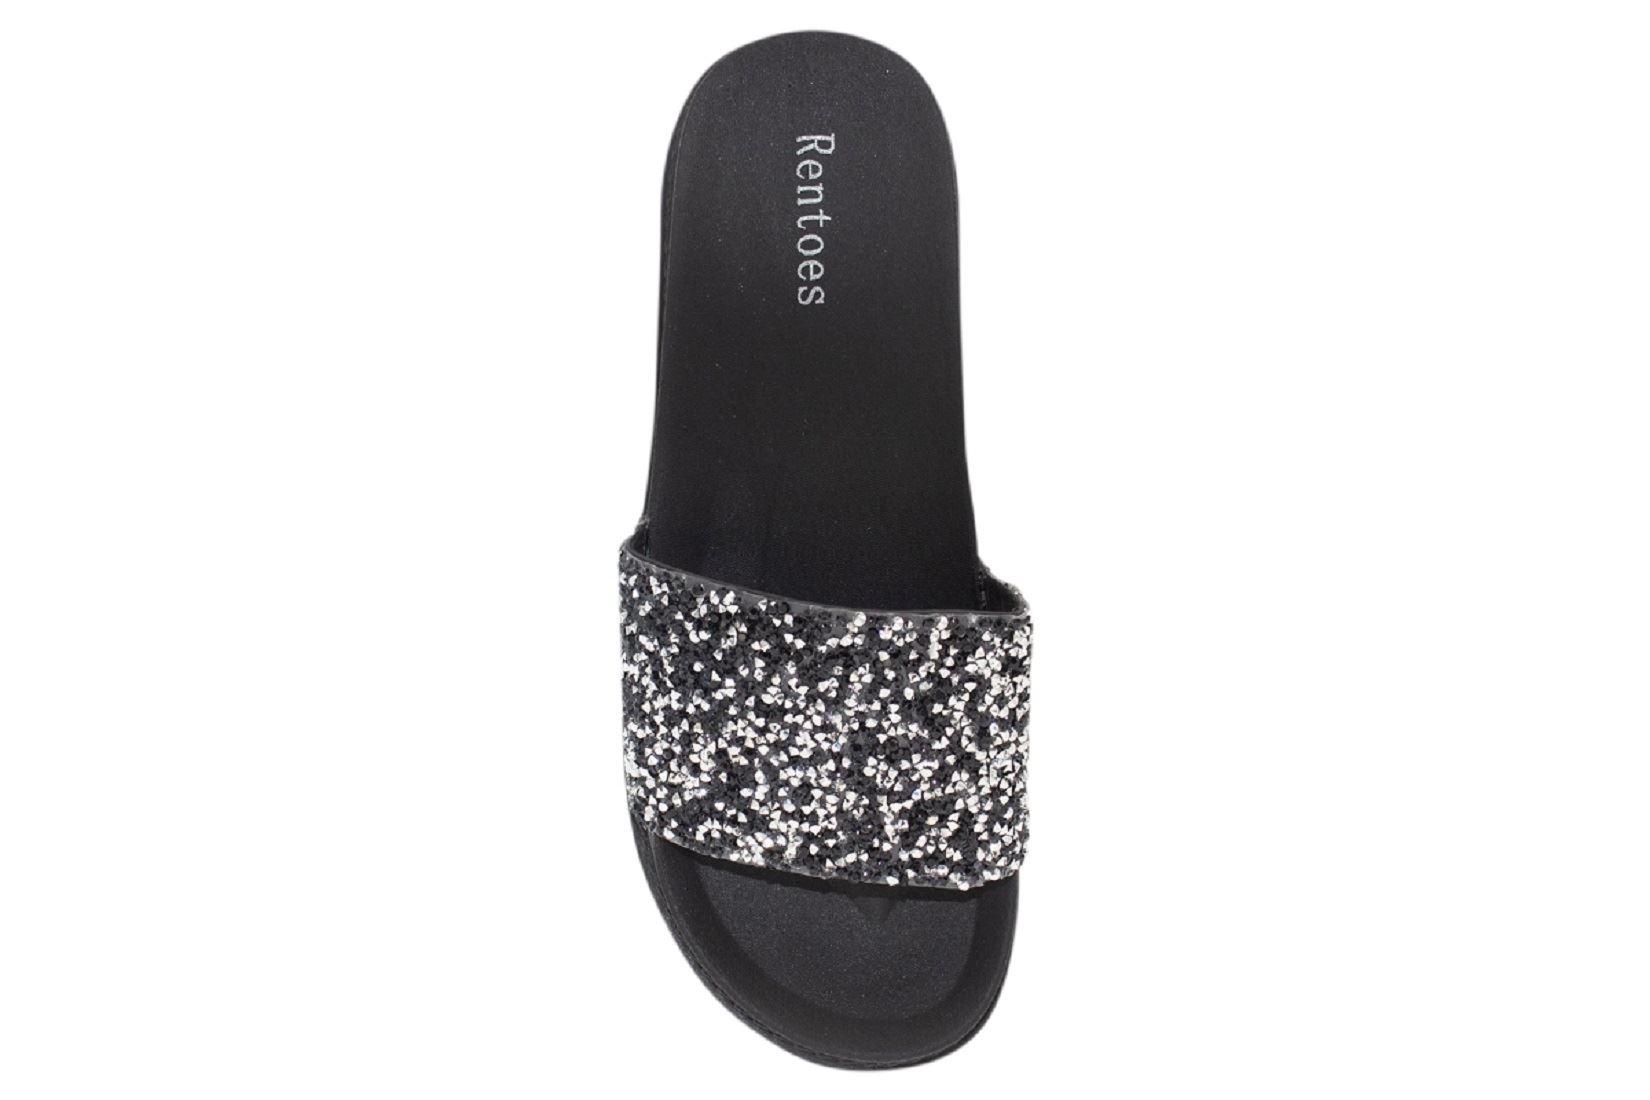 Womens-Sliders-Casual-Slippers-Mules-Ladies-Diamante-Flip-Flop-Sandals-Shoes thumbnail 7